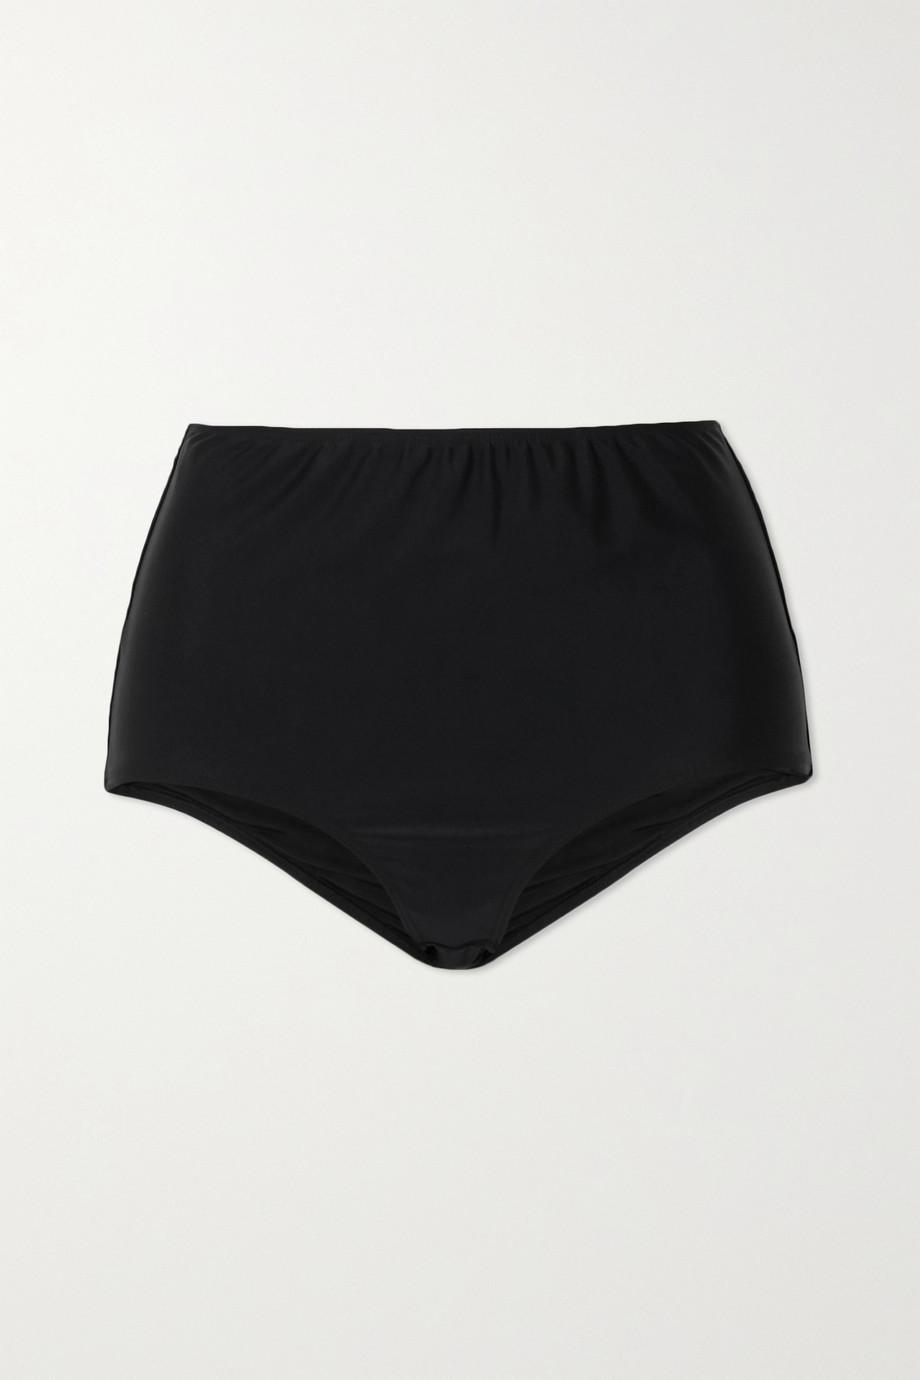 Cover + NET SUSTAIN Bikini-Höschen aus Stretch-Material